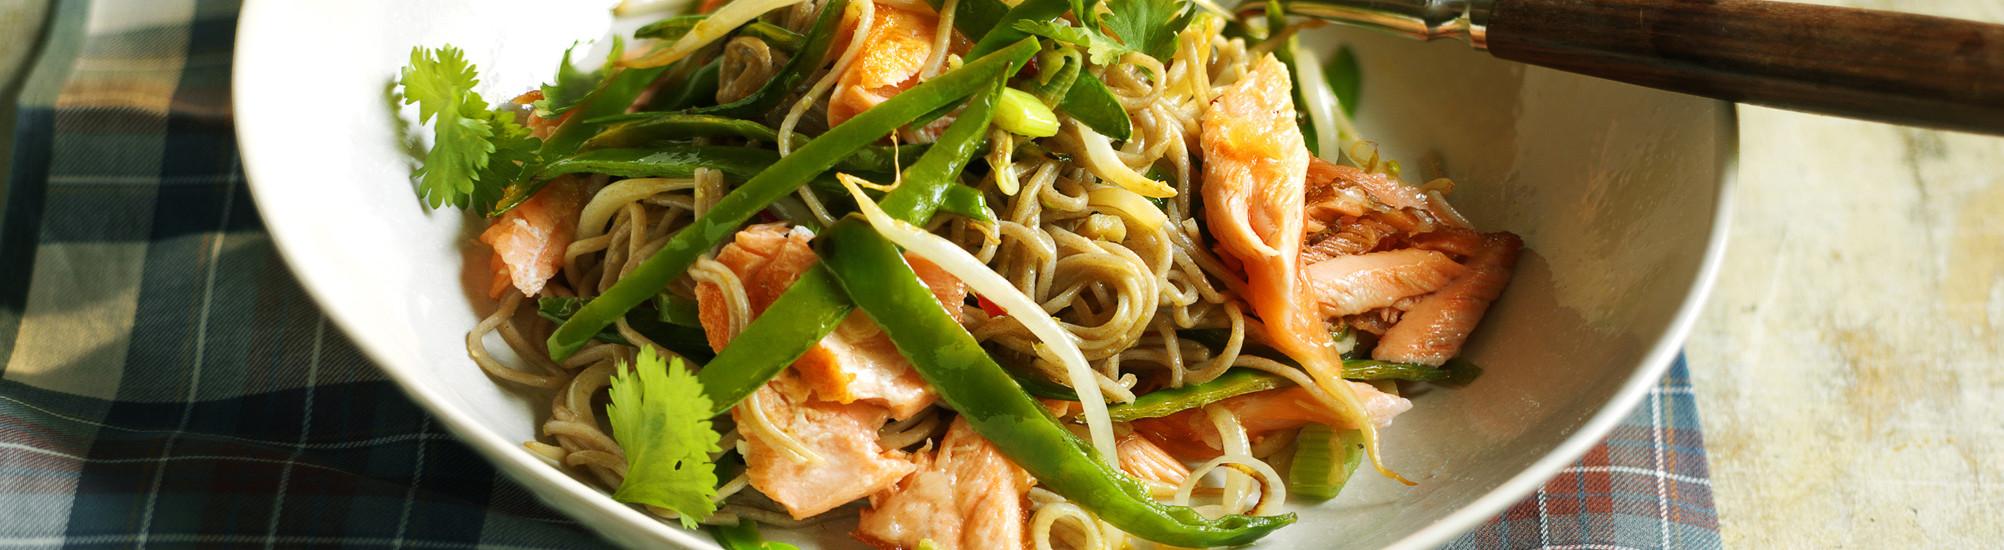 Salmon Stir-Fry with Soba recipe